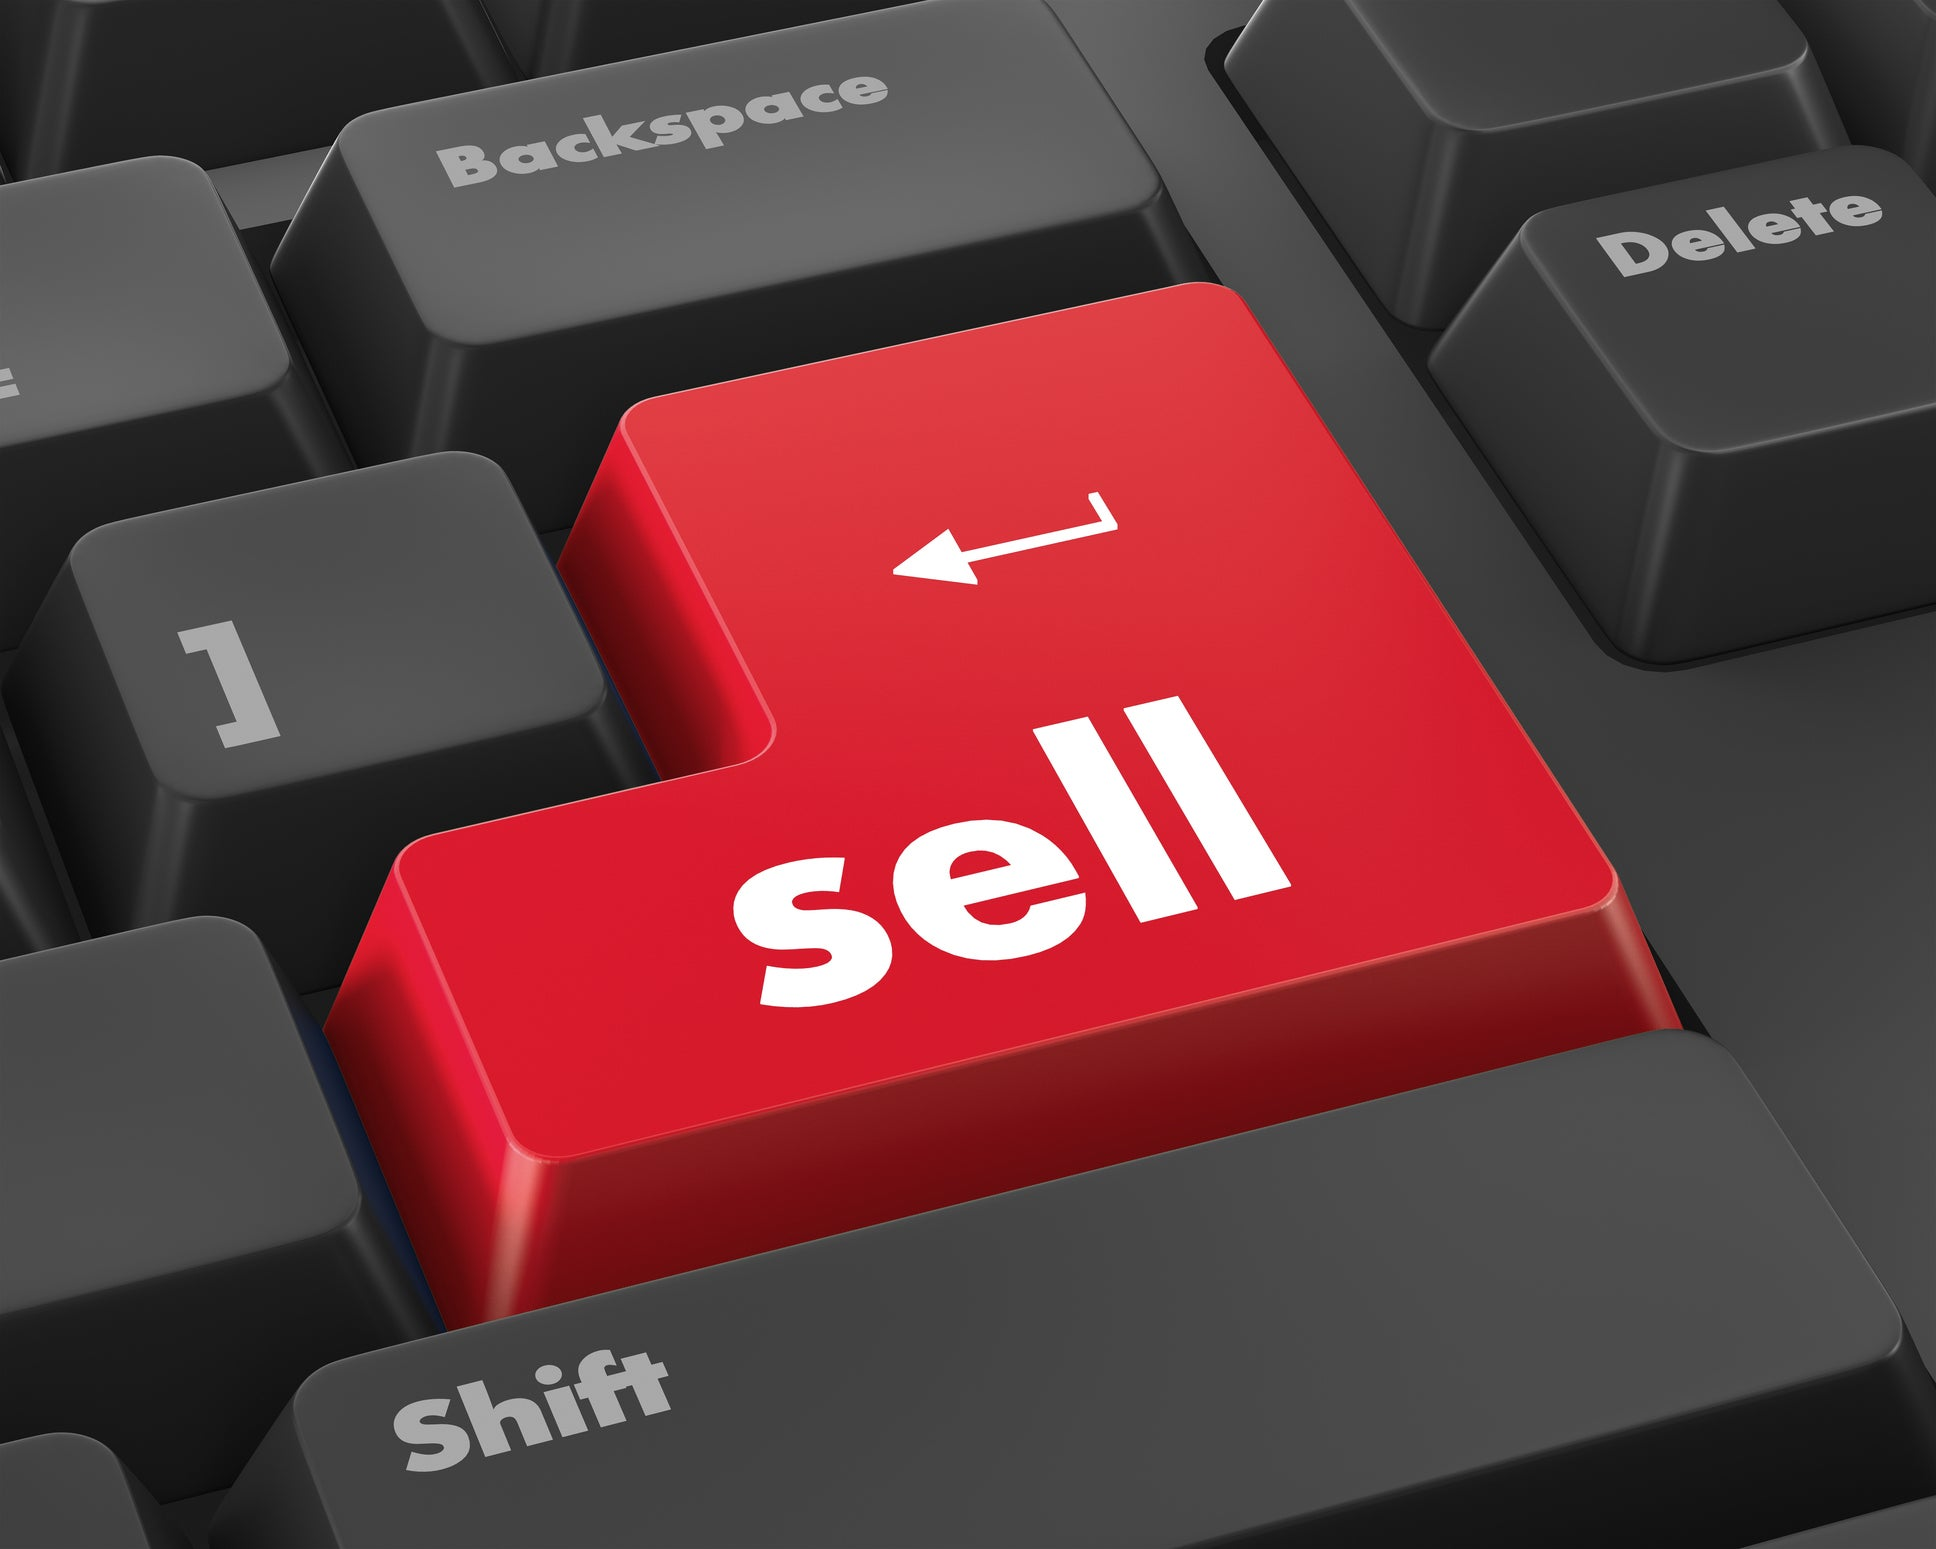 Sau Thiên Tân, Him Lam bán 10 triệu cổ phiếu DIG